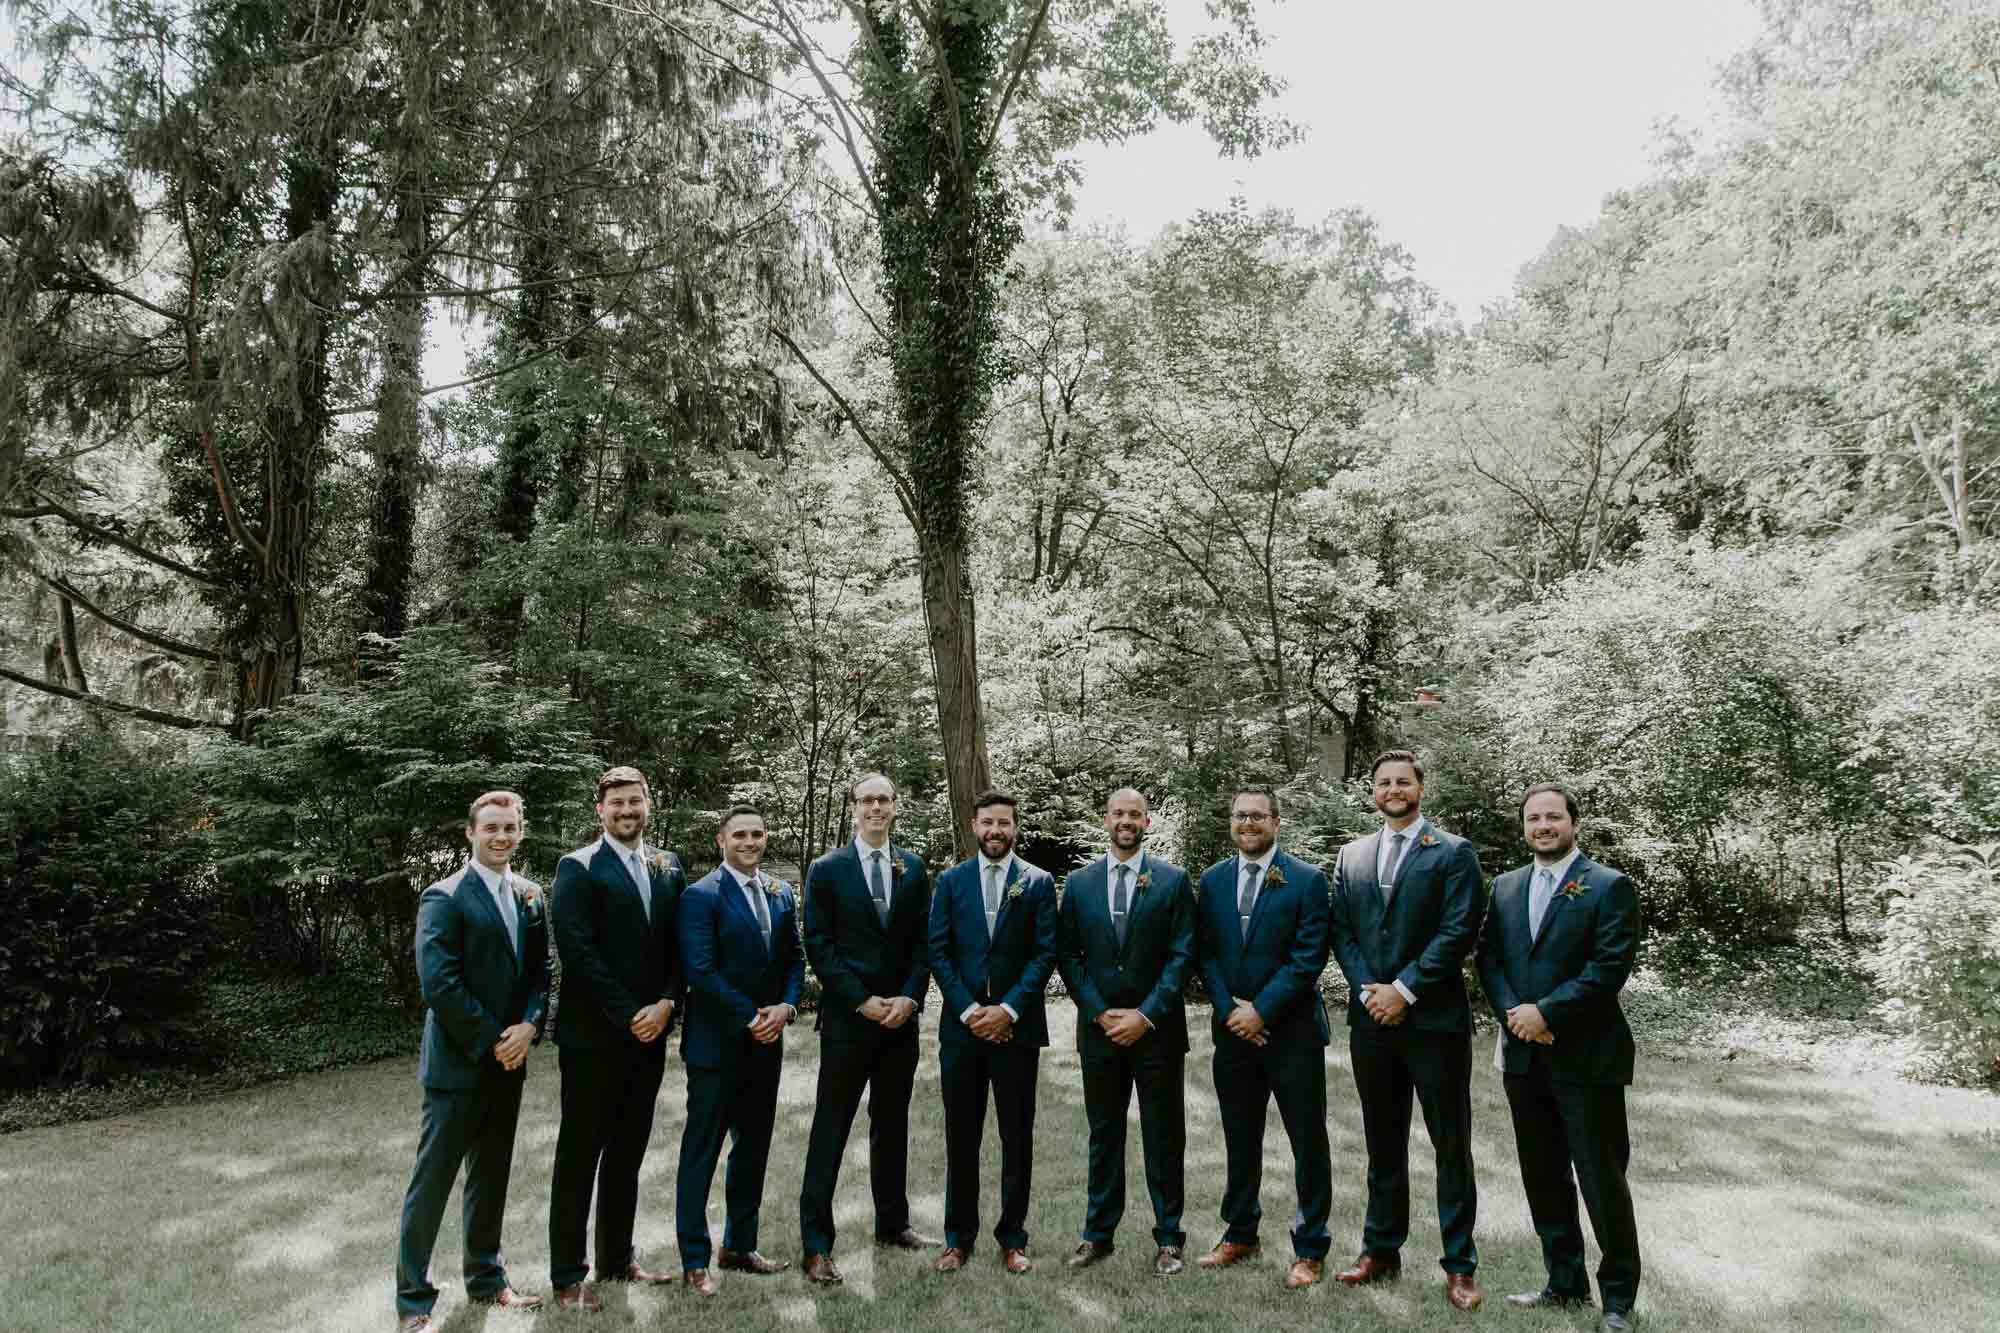 journeyman_distillery_wedding_photographer_chicago_il_wright_photographs-5930.jpg